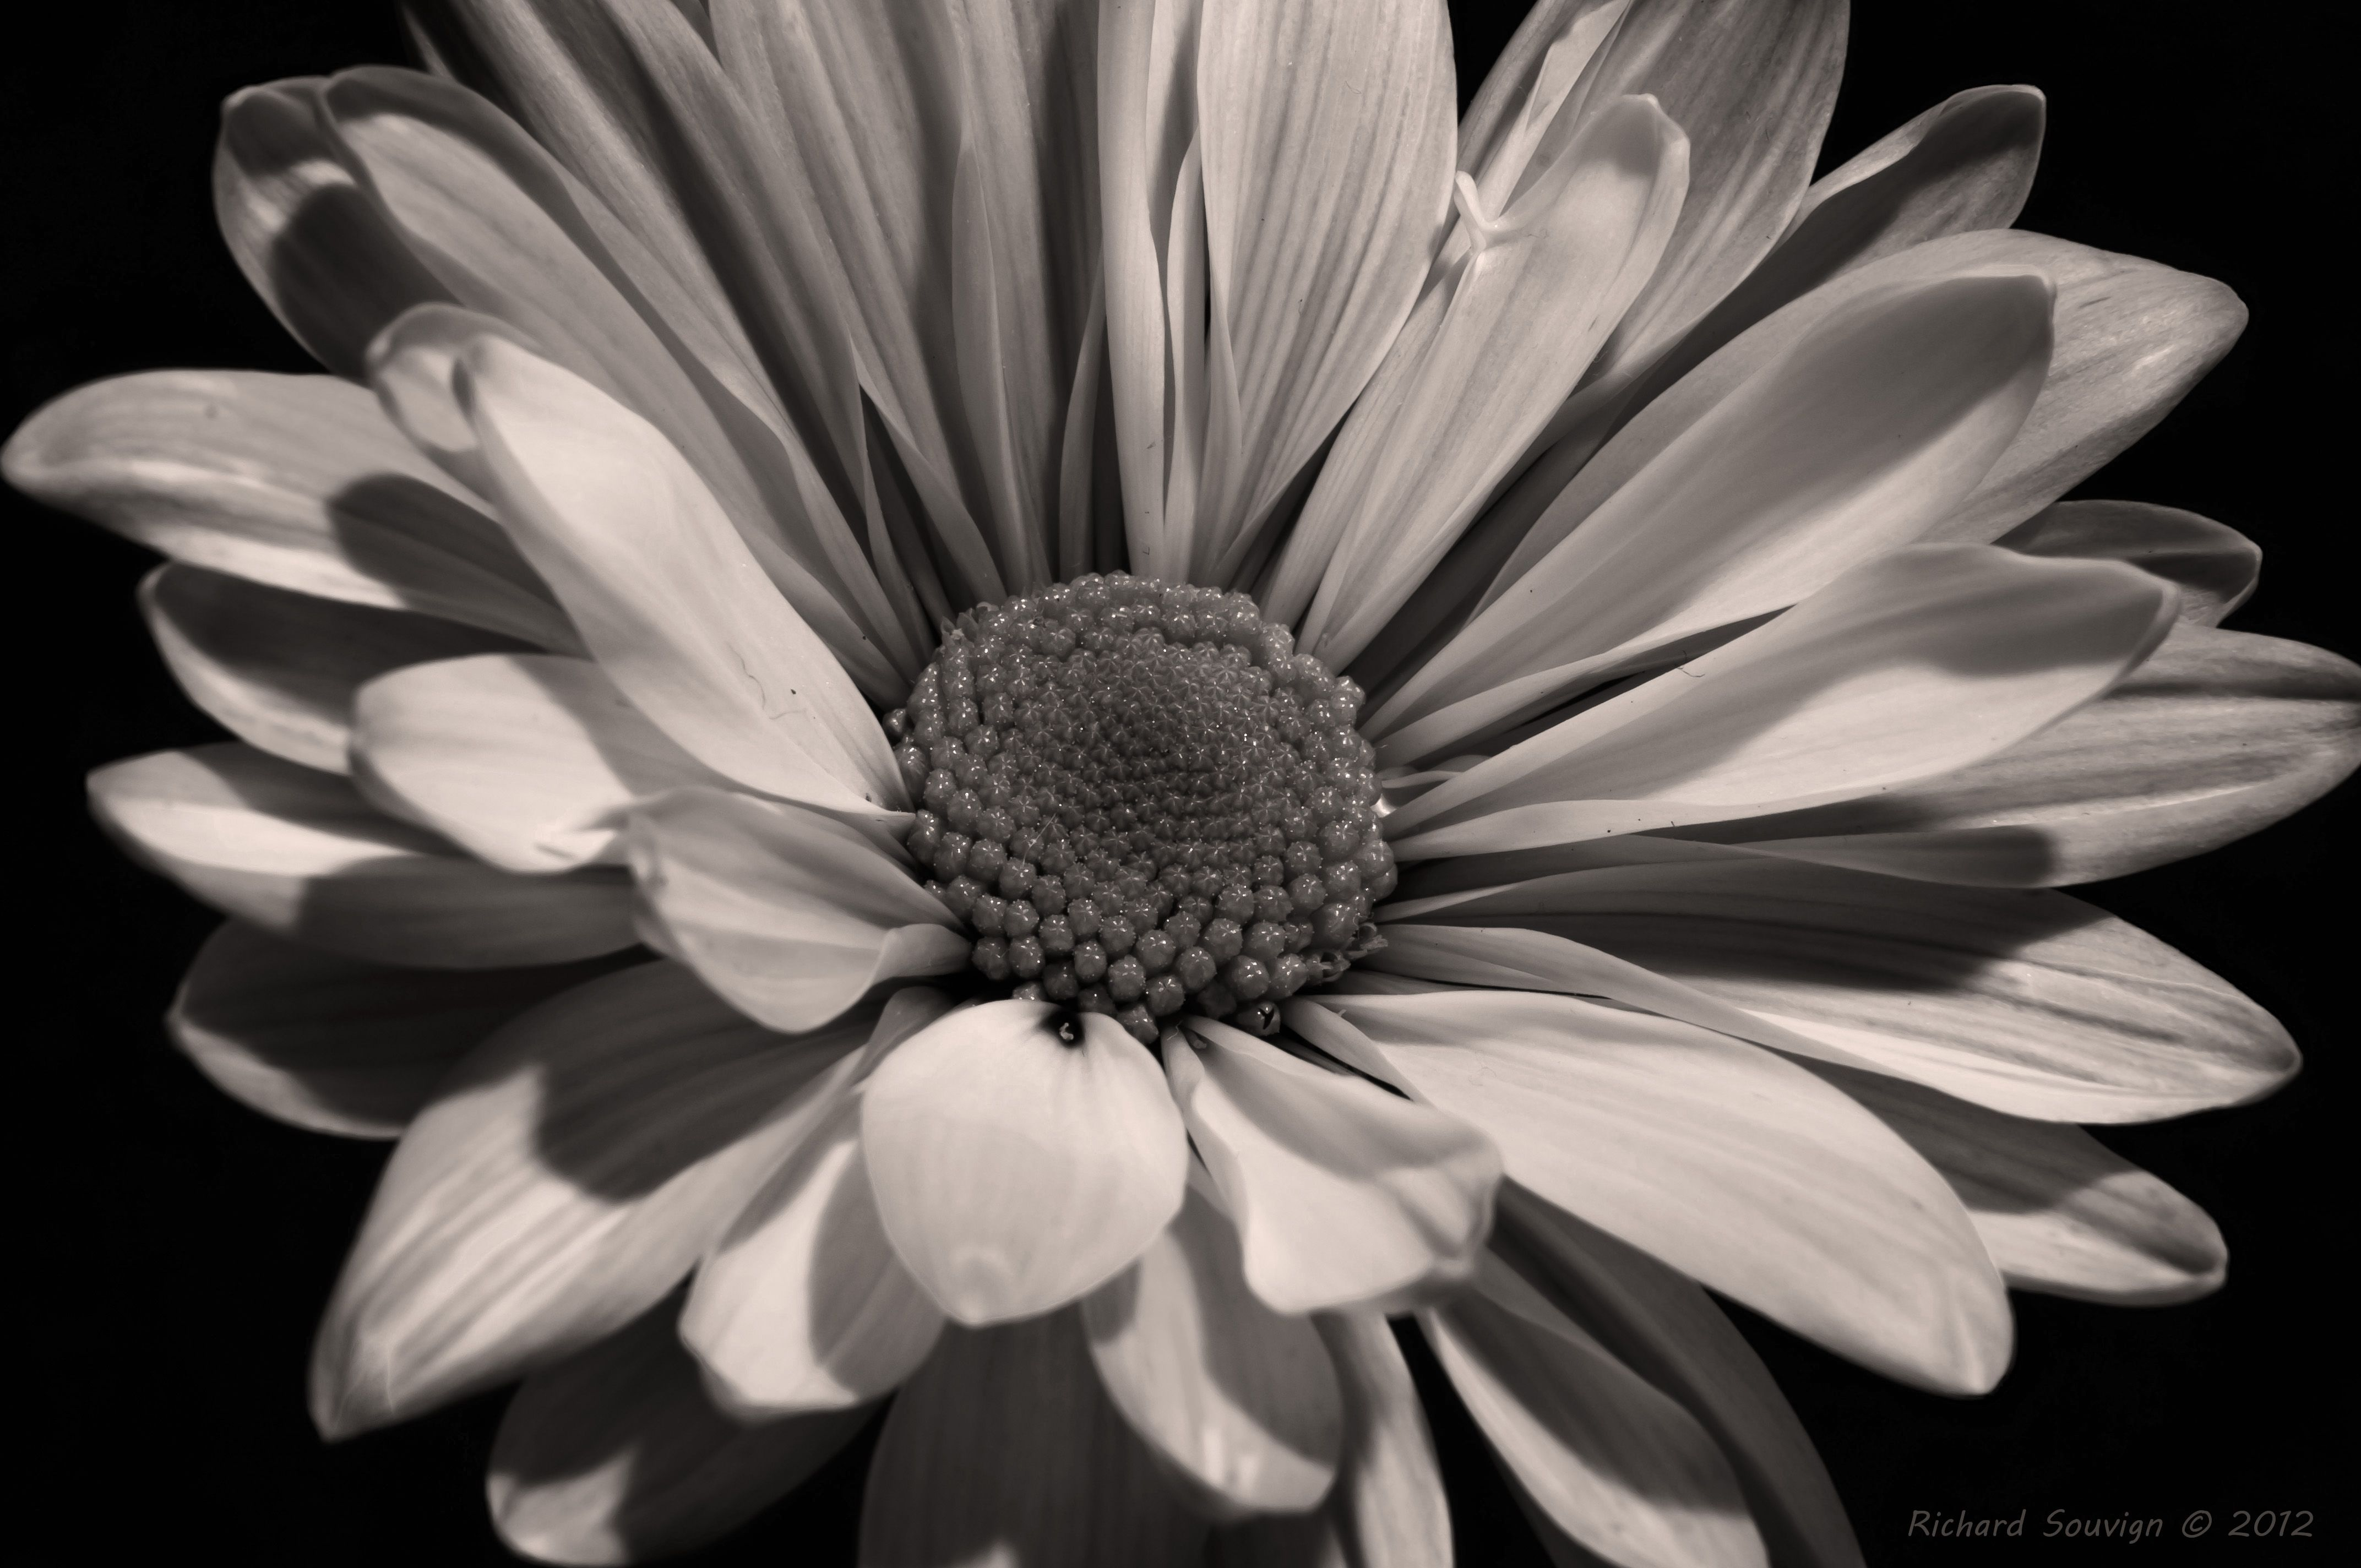 Black And White Sunflower Wallpaper White sunflowers